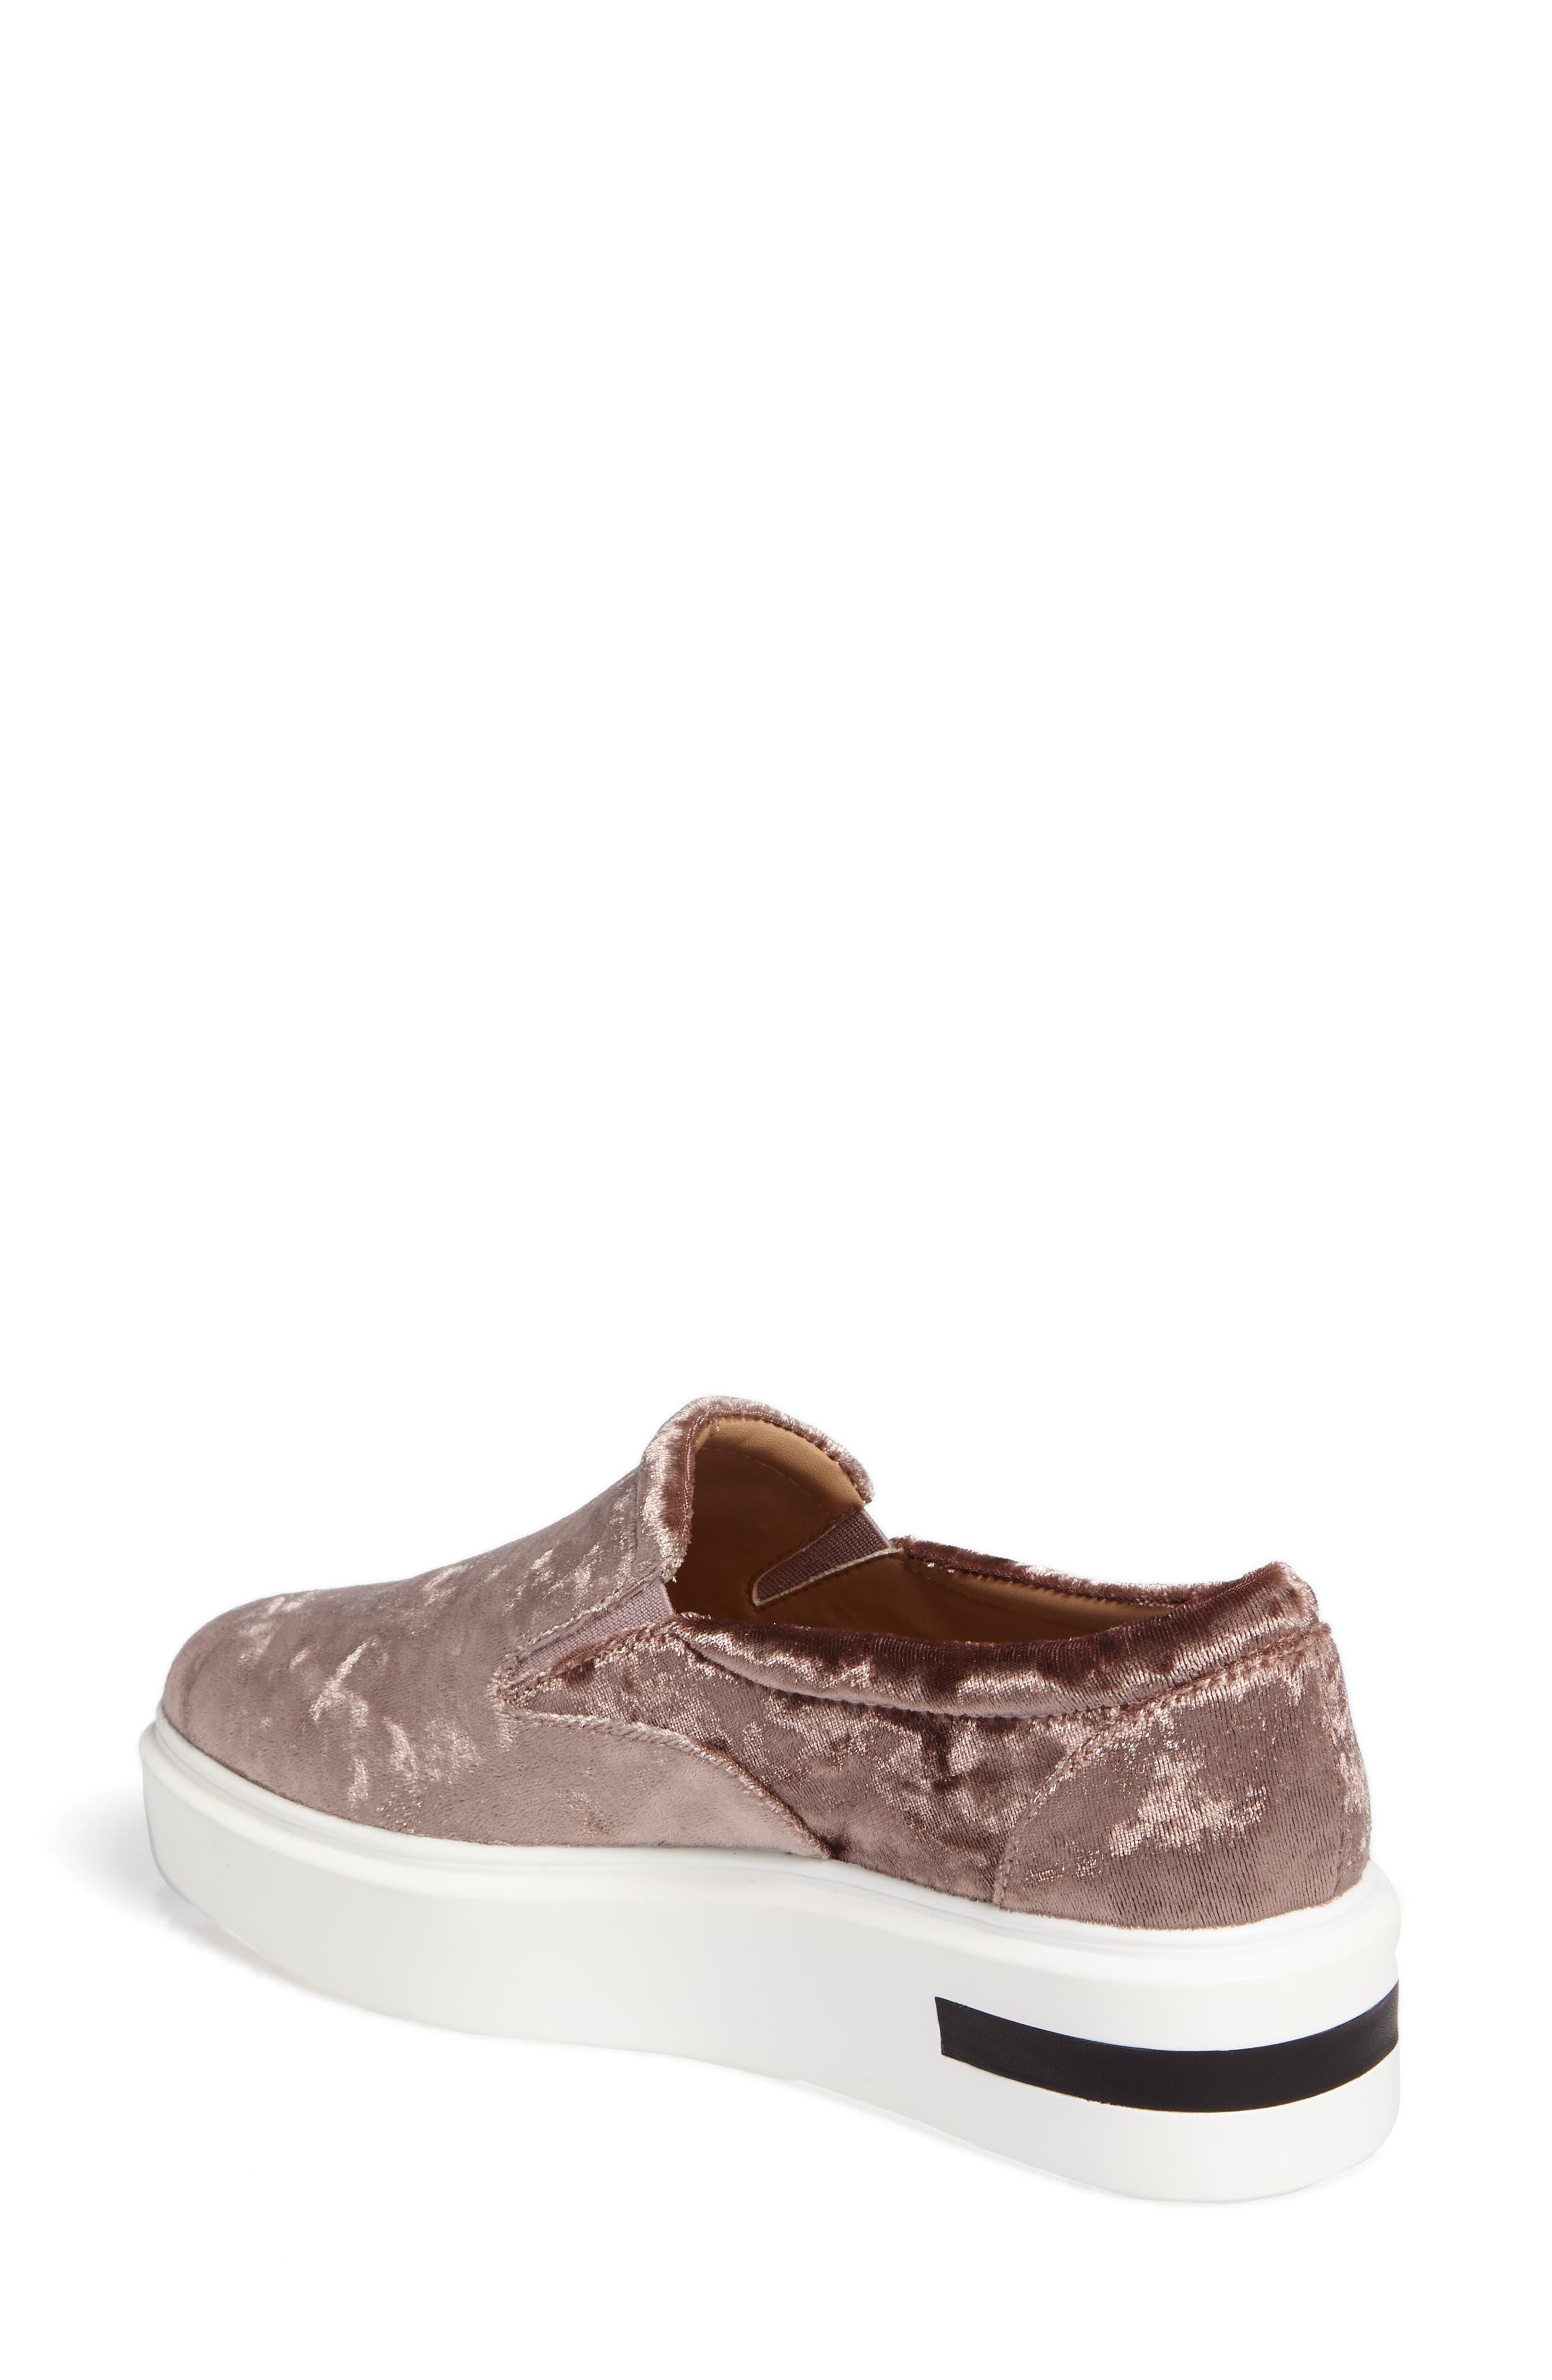 Alternate Image 2  - Linea Paolo Fairfax Platform Sneaker (Women)